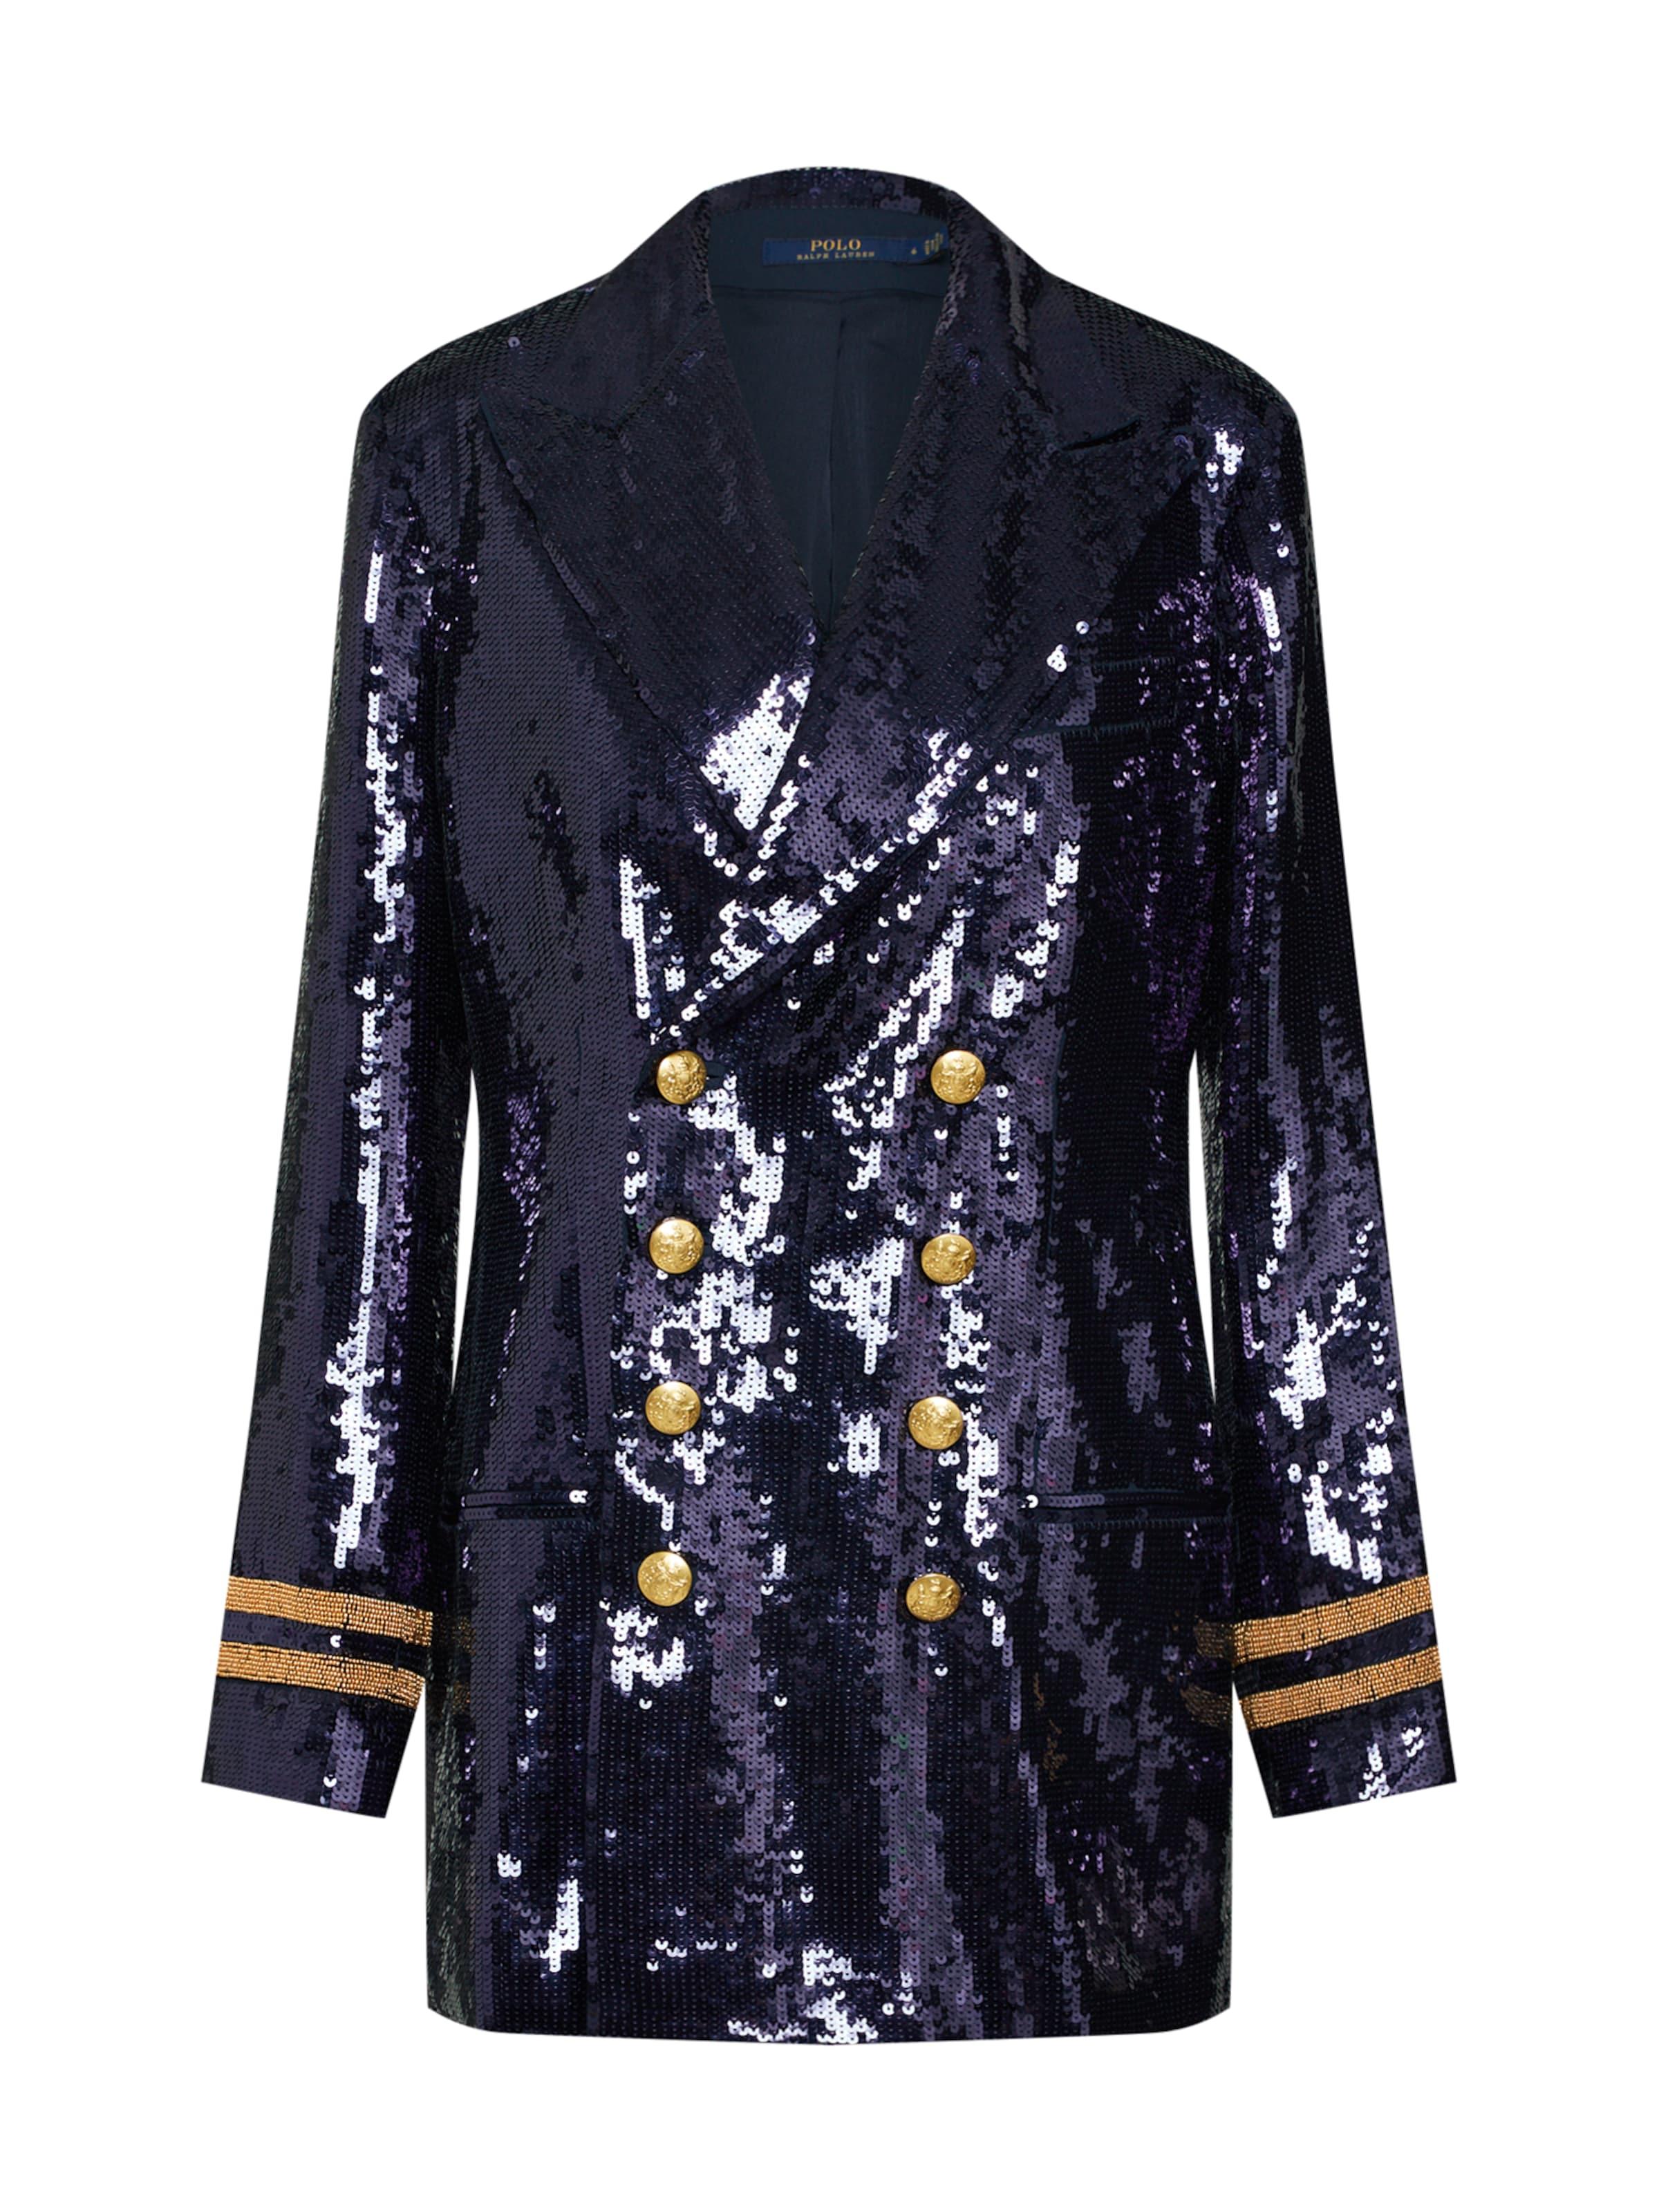 Bzr 'lng NavyGold Blazer Polo blazer' In Lauren Ralph Bre nwXP8OkN0